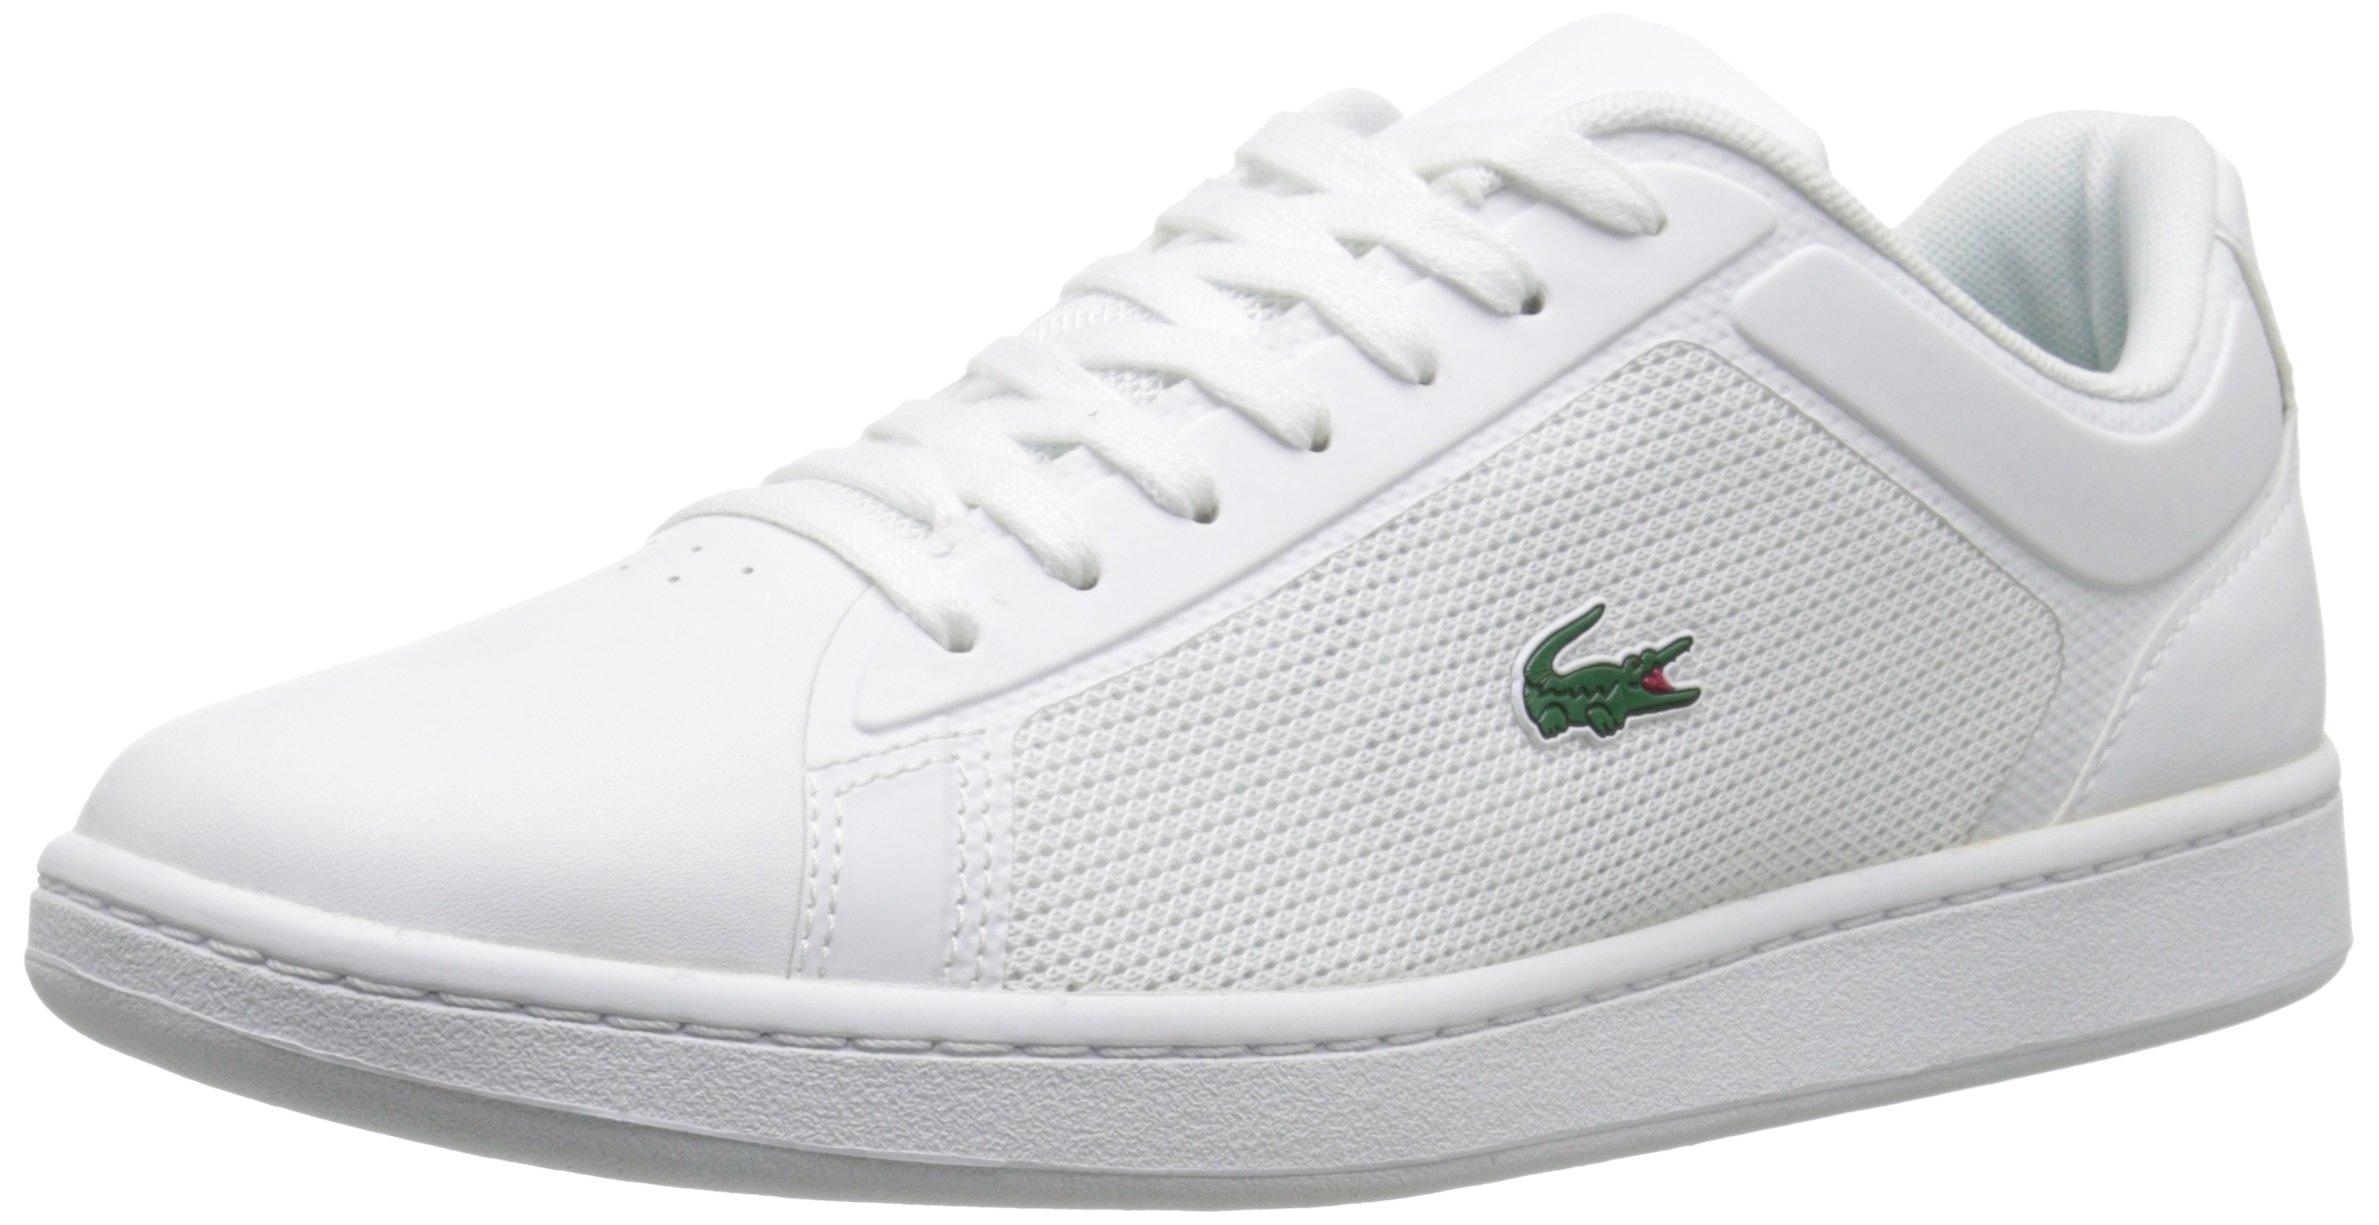 Lacoste Men's Endliner 116 2 Fashion Sneaker, White, 10 M US